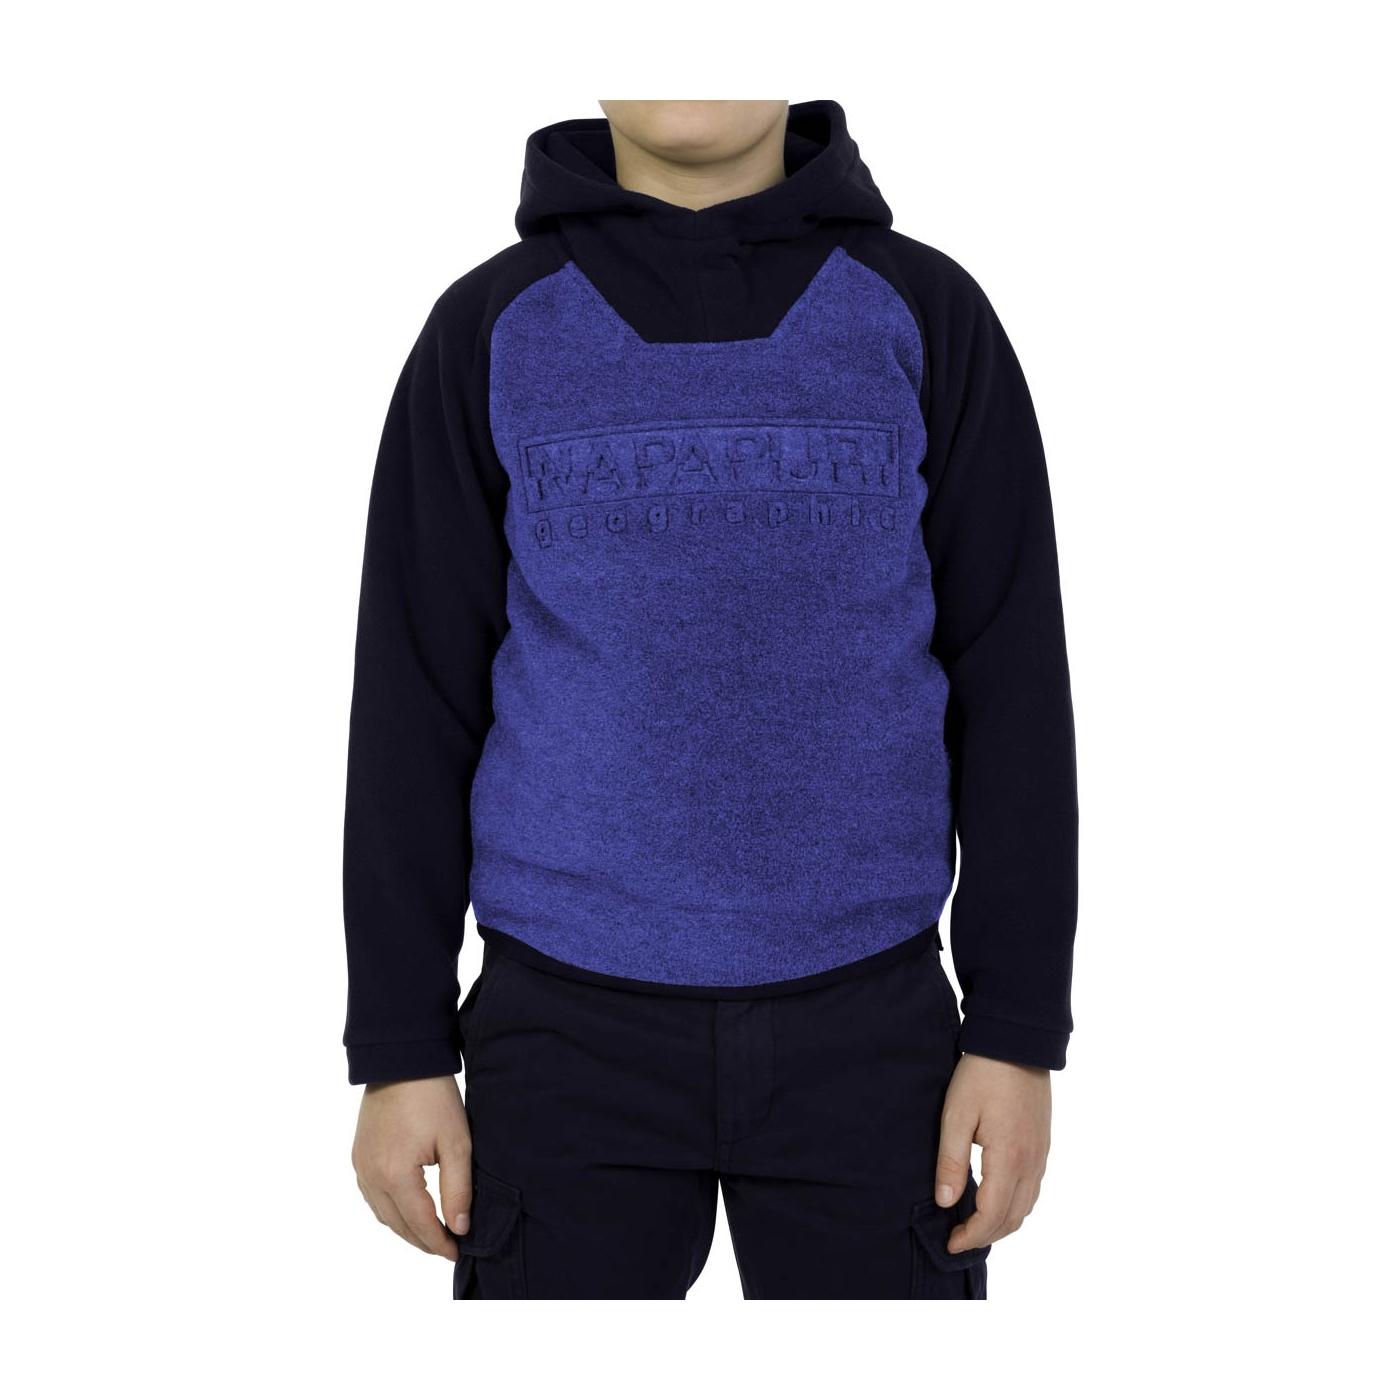 784b09813abfc Sweatshirt Napapijri K Tantan Multicoulour Blue | Alltricks.com